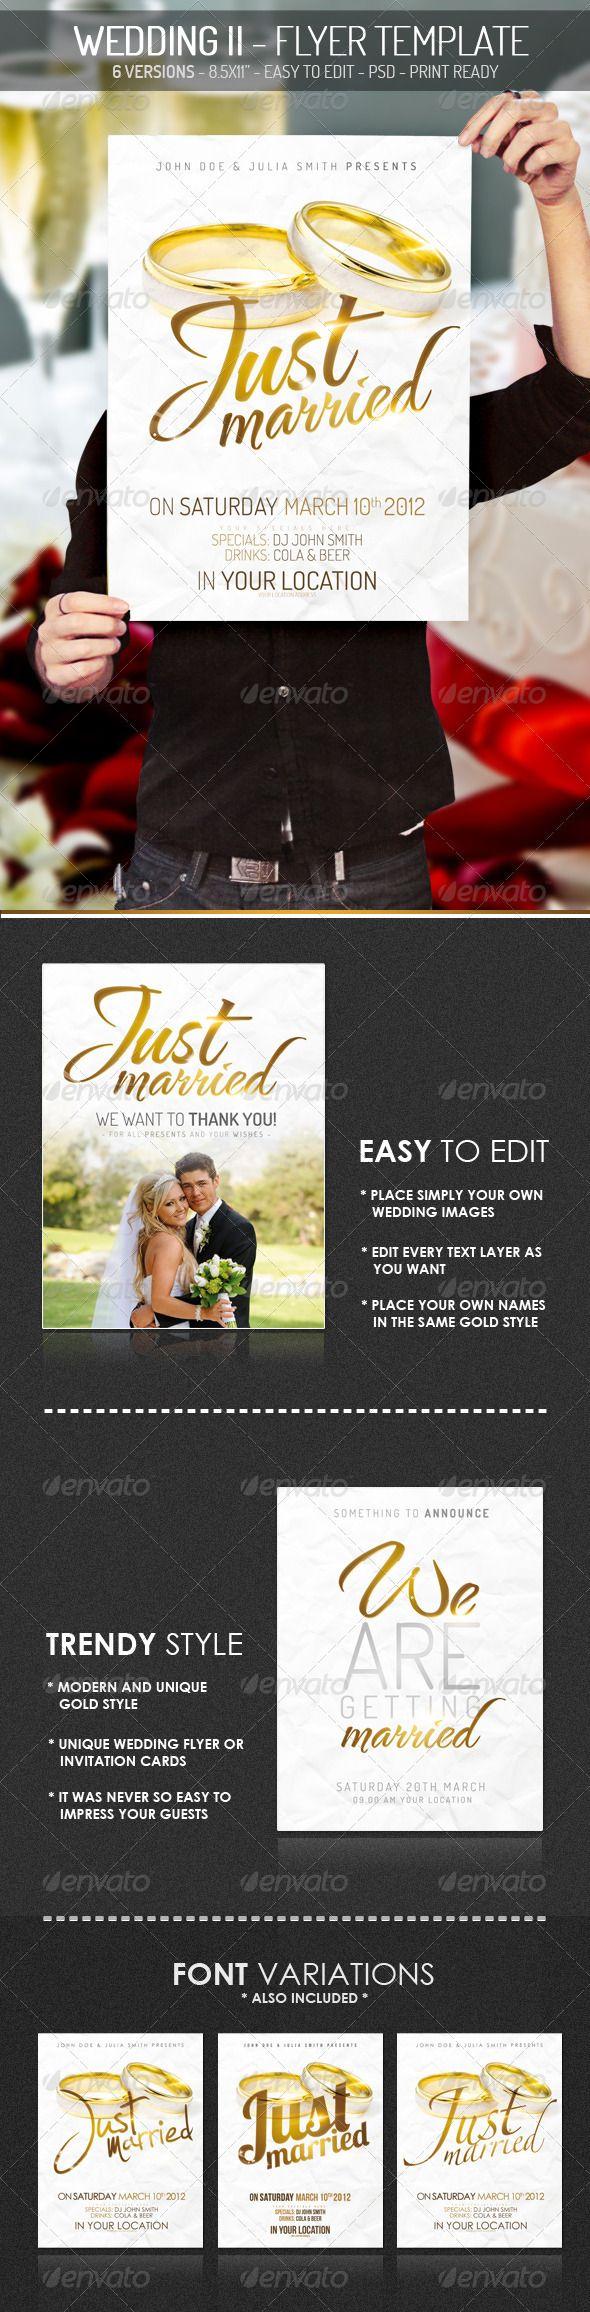 Wedding II - Flyer Template - Clubs & Parties Events